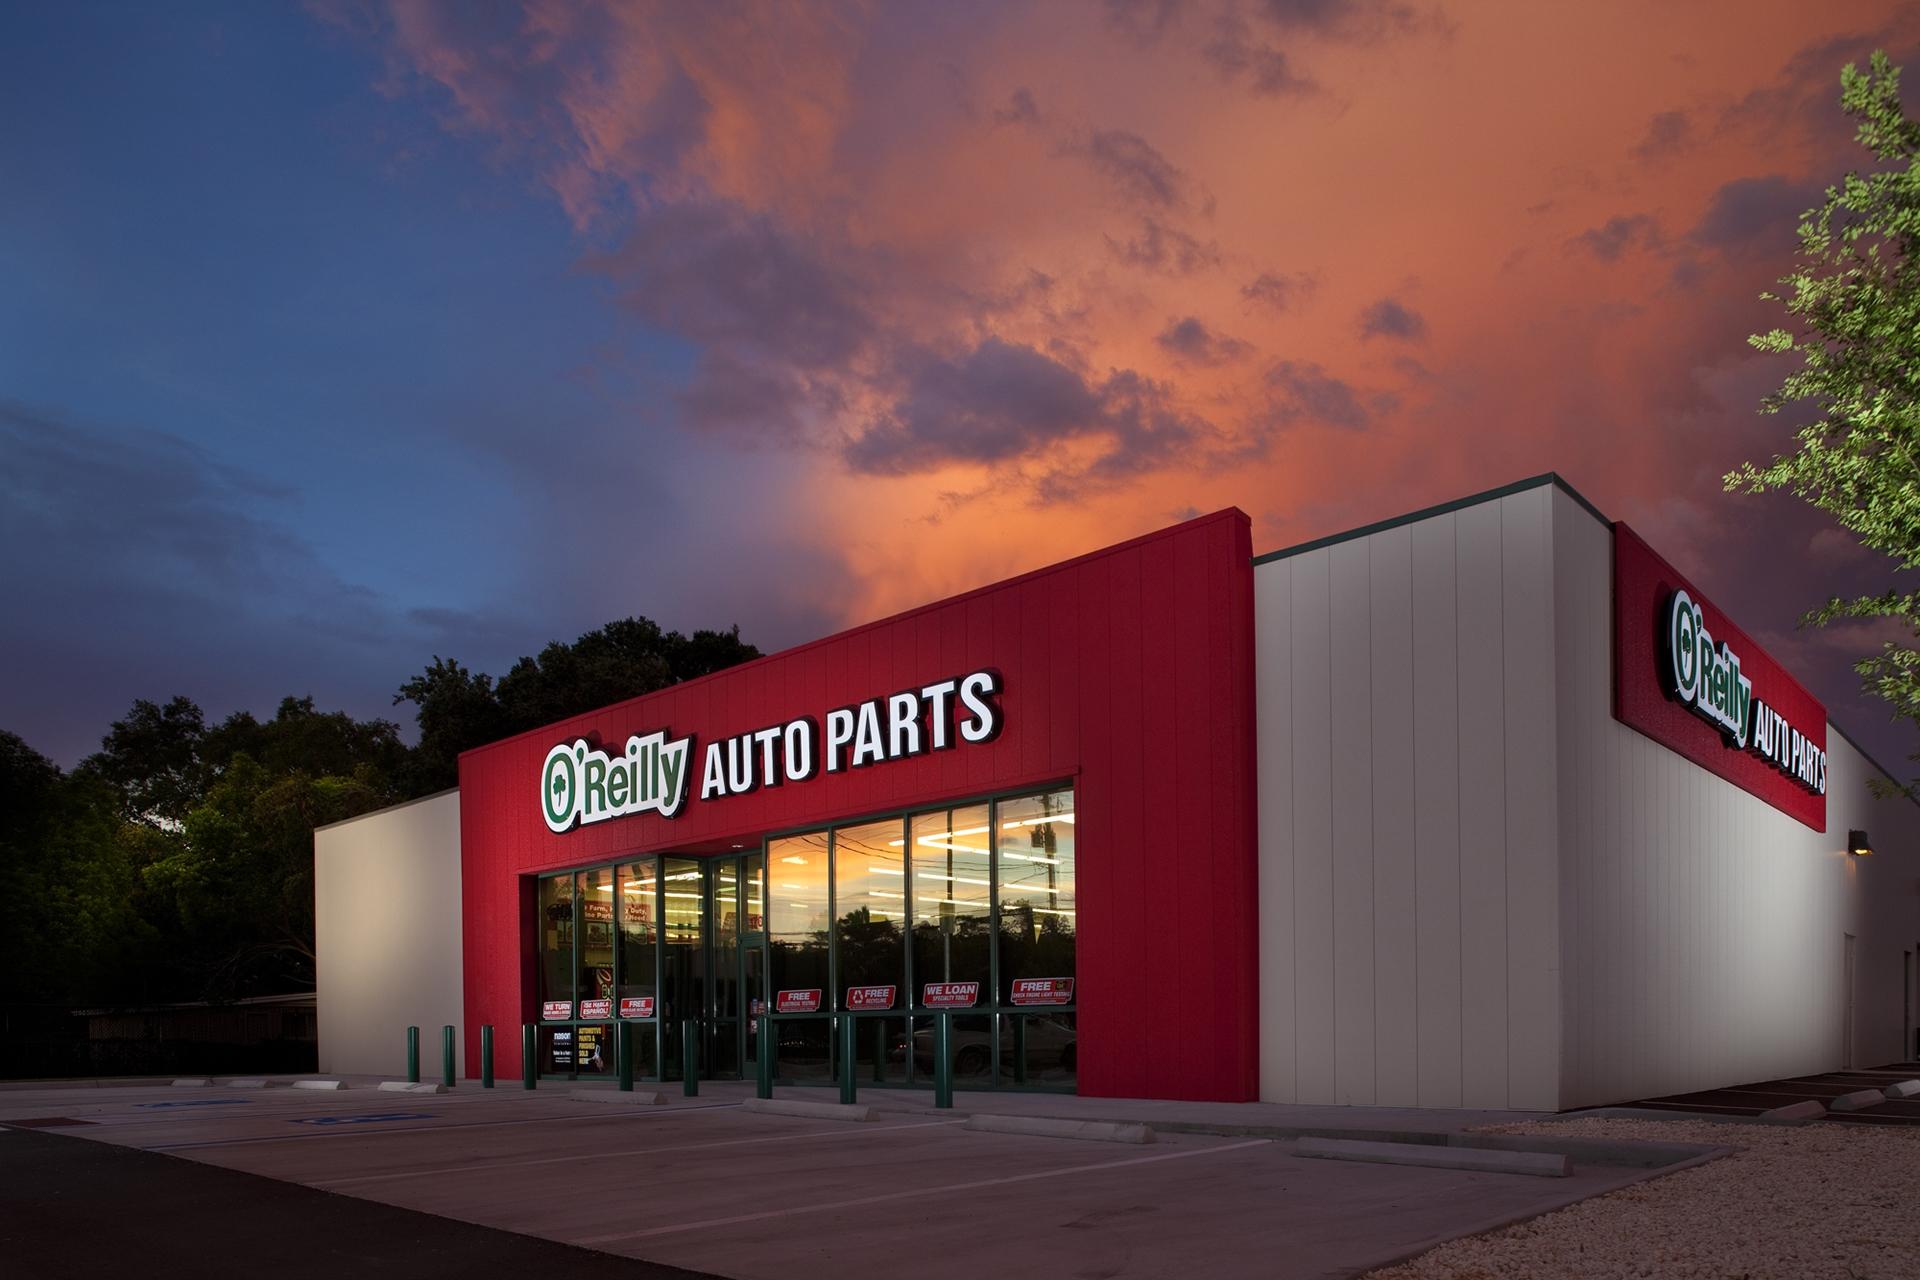 O'Reilly Auto Parts4.jpg